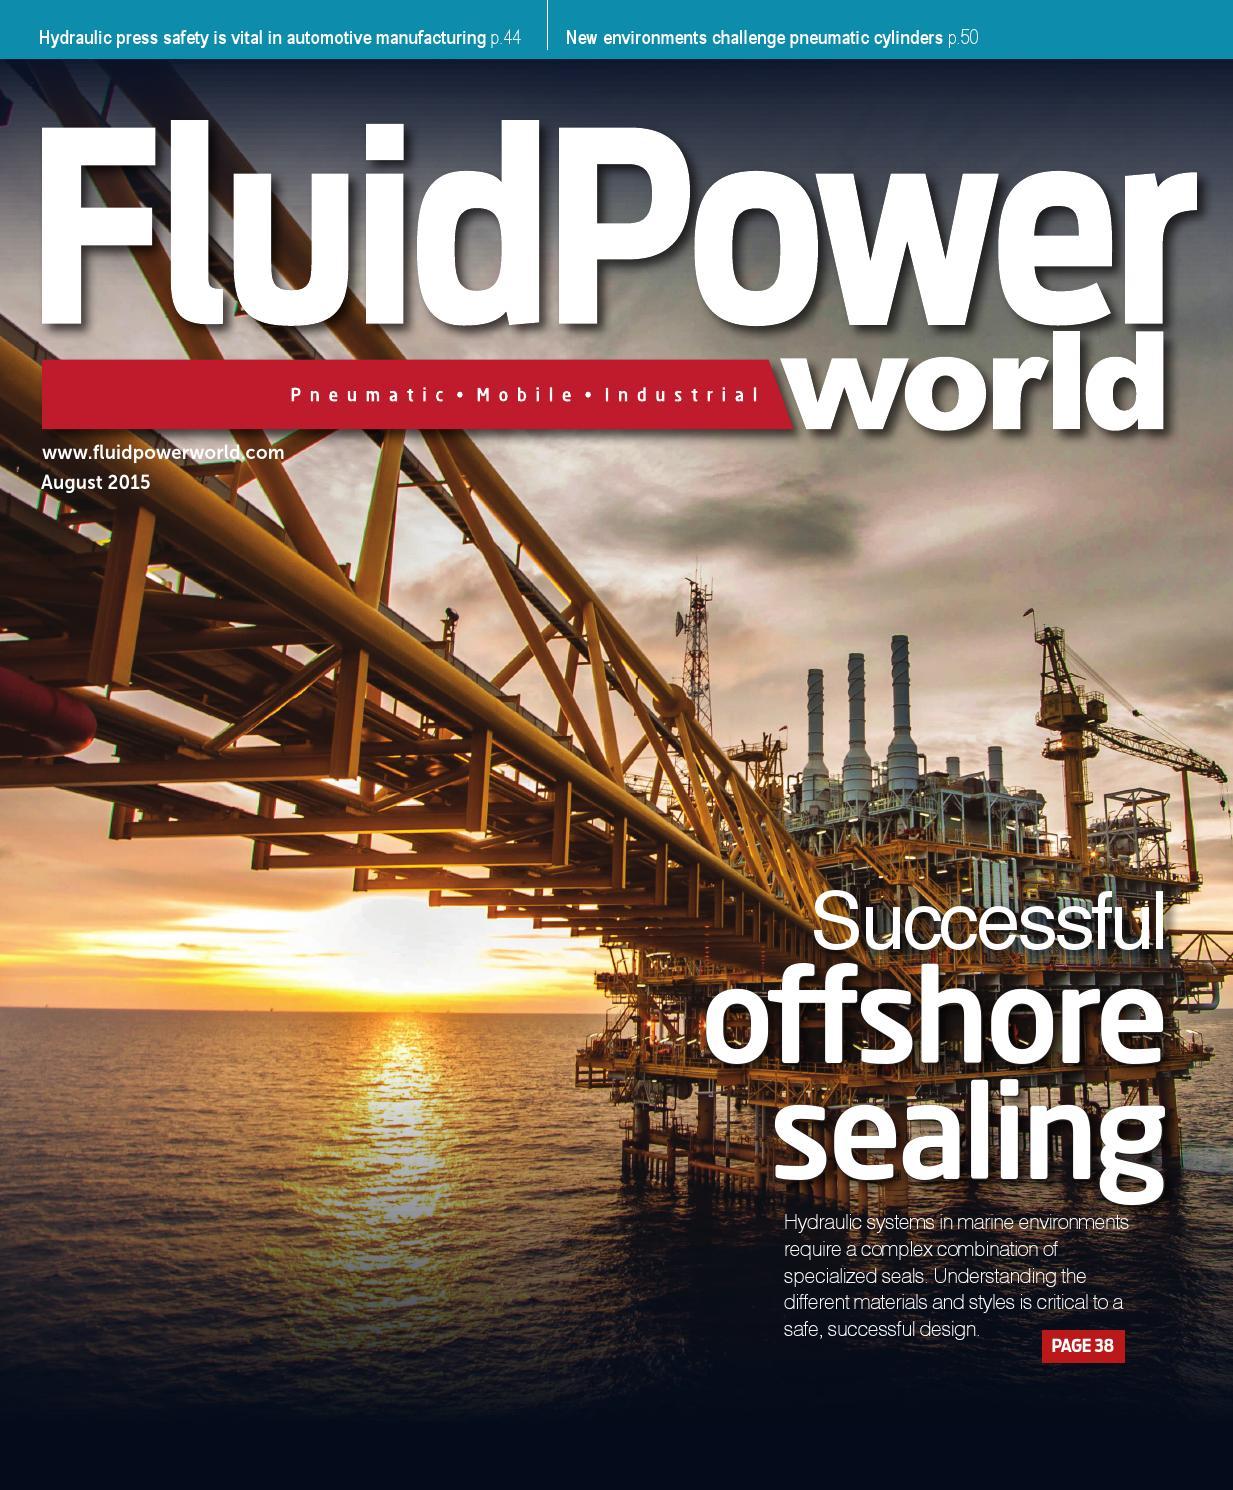 Fluid Power World August 2015 By Wtwh Media Llc Issuu Simple Hydraulic Press How To Control Decompression In